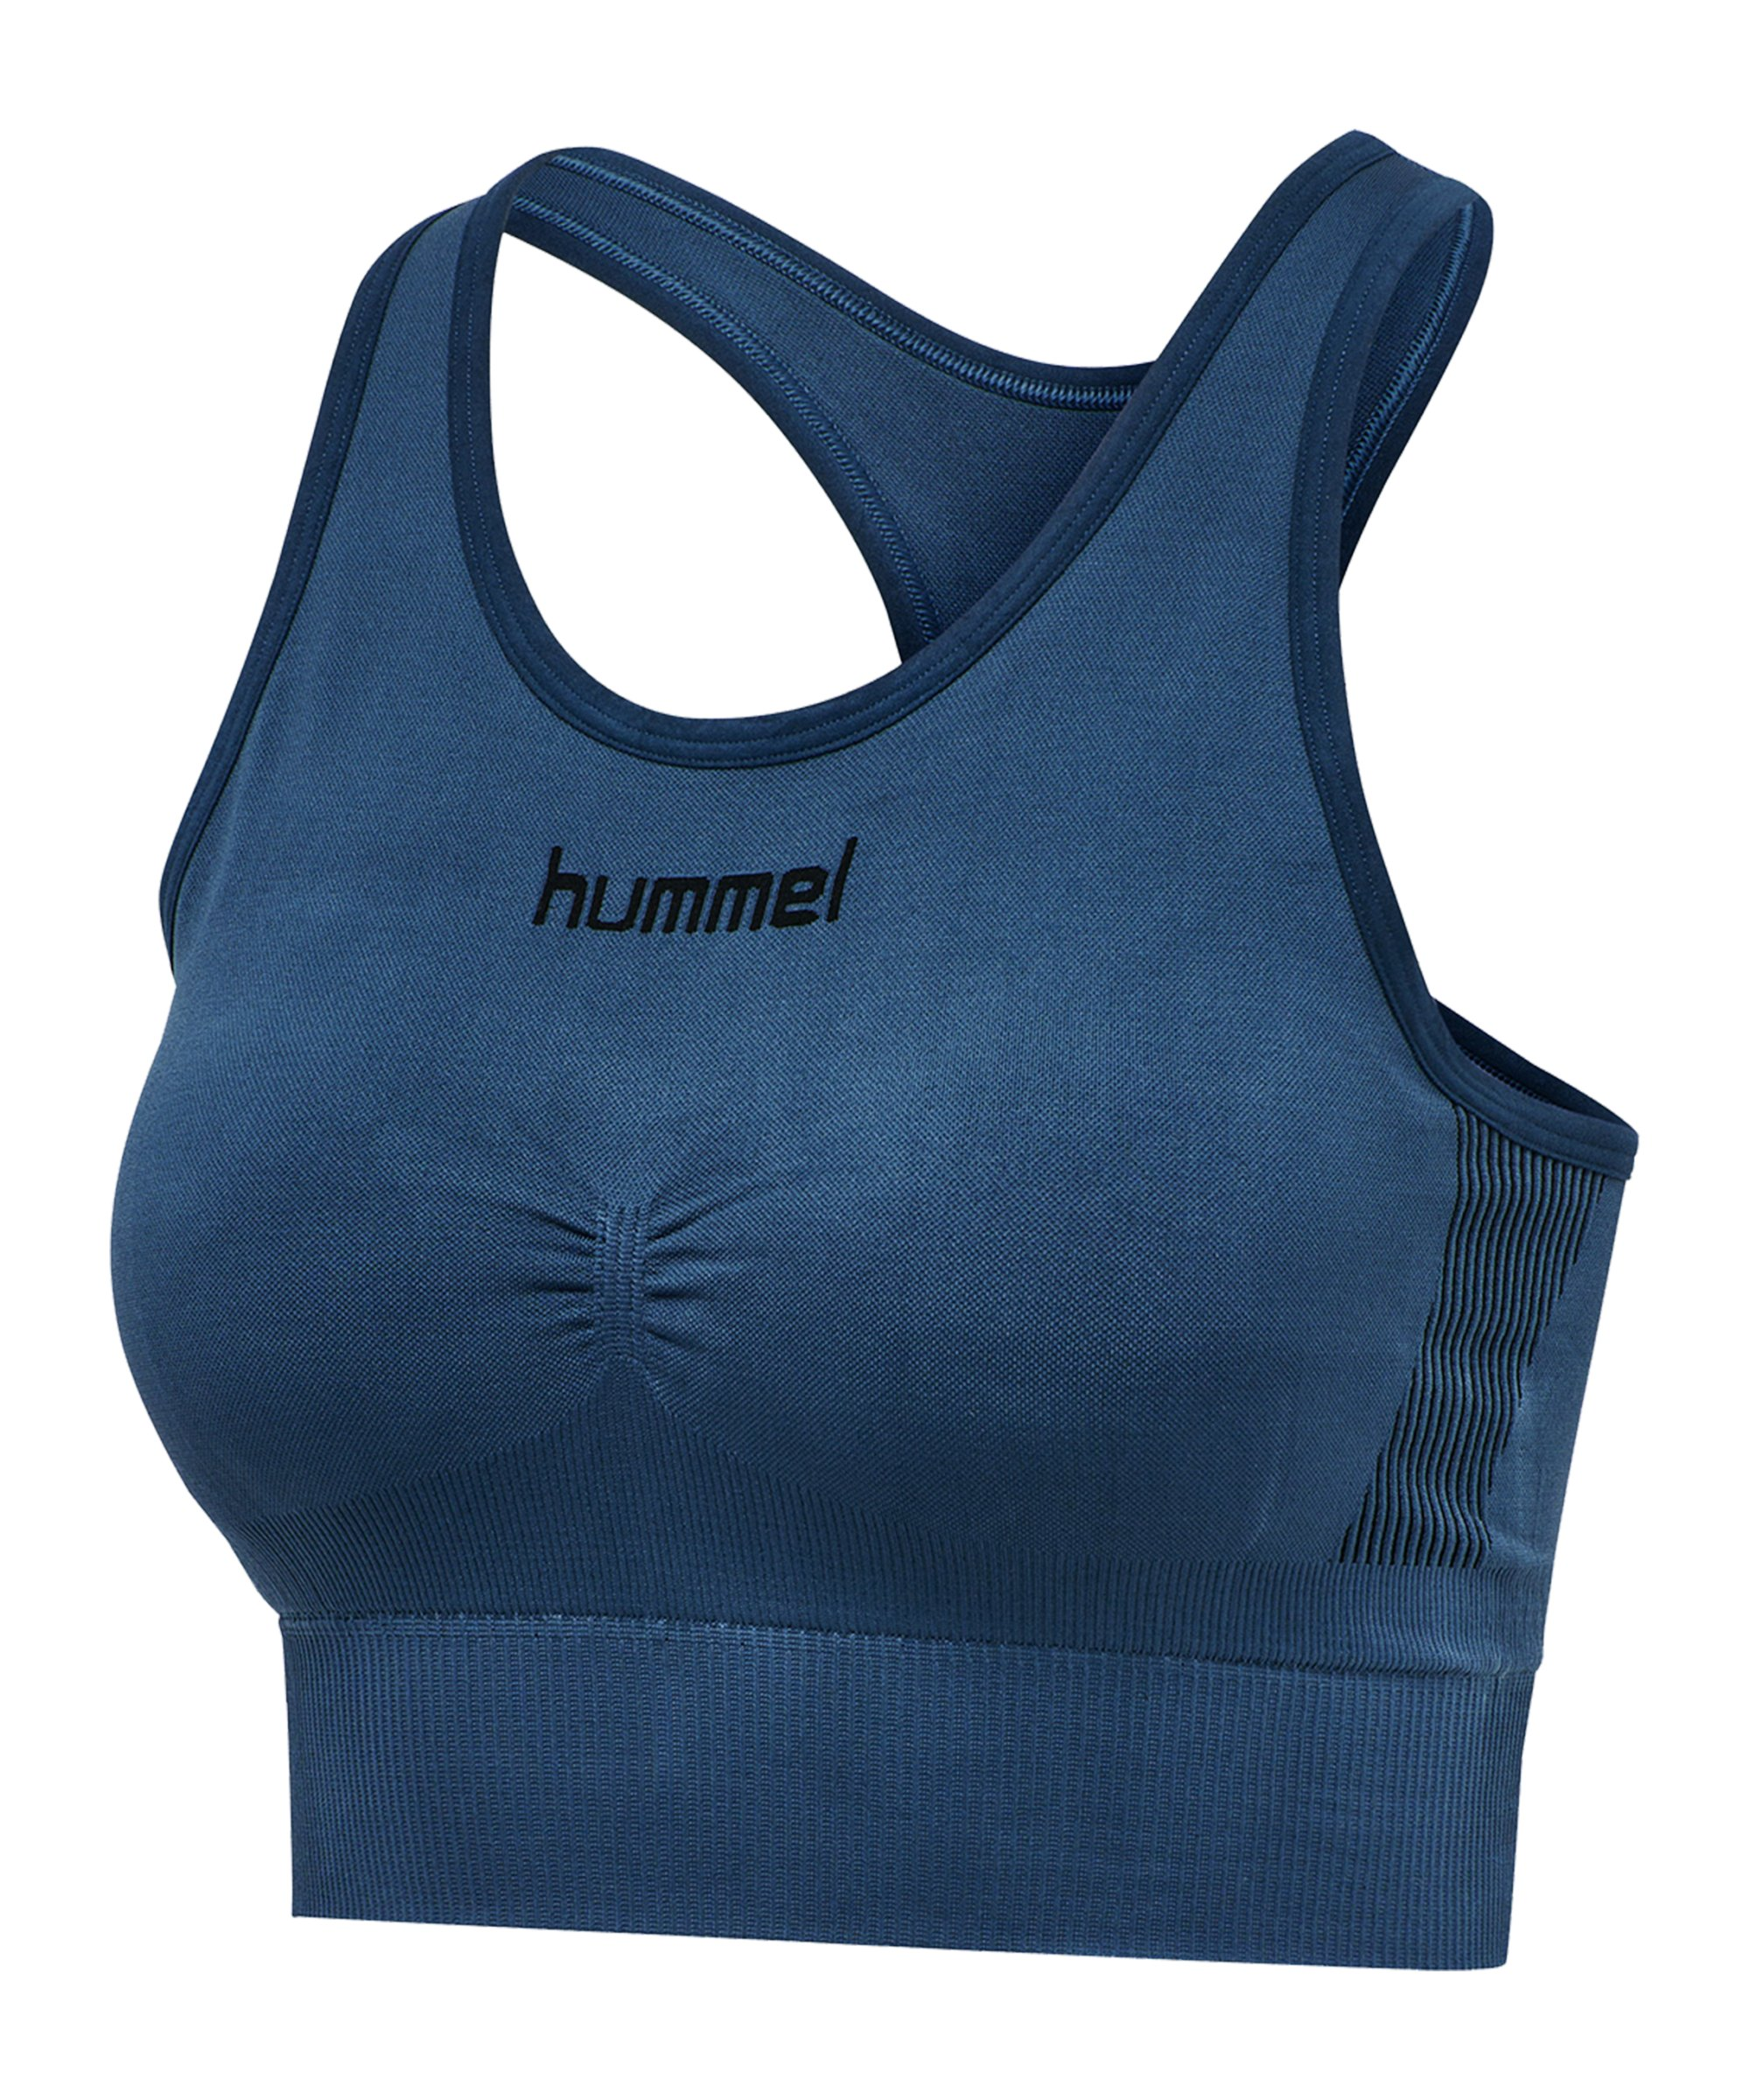 Hummel First Seamless Sport-BH Bra Damen F7642 - blau